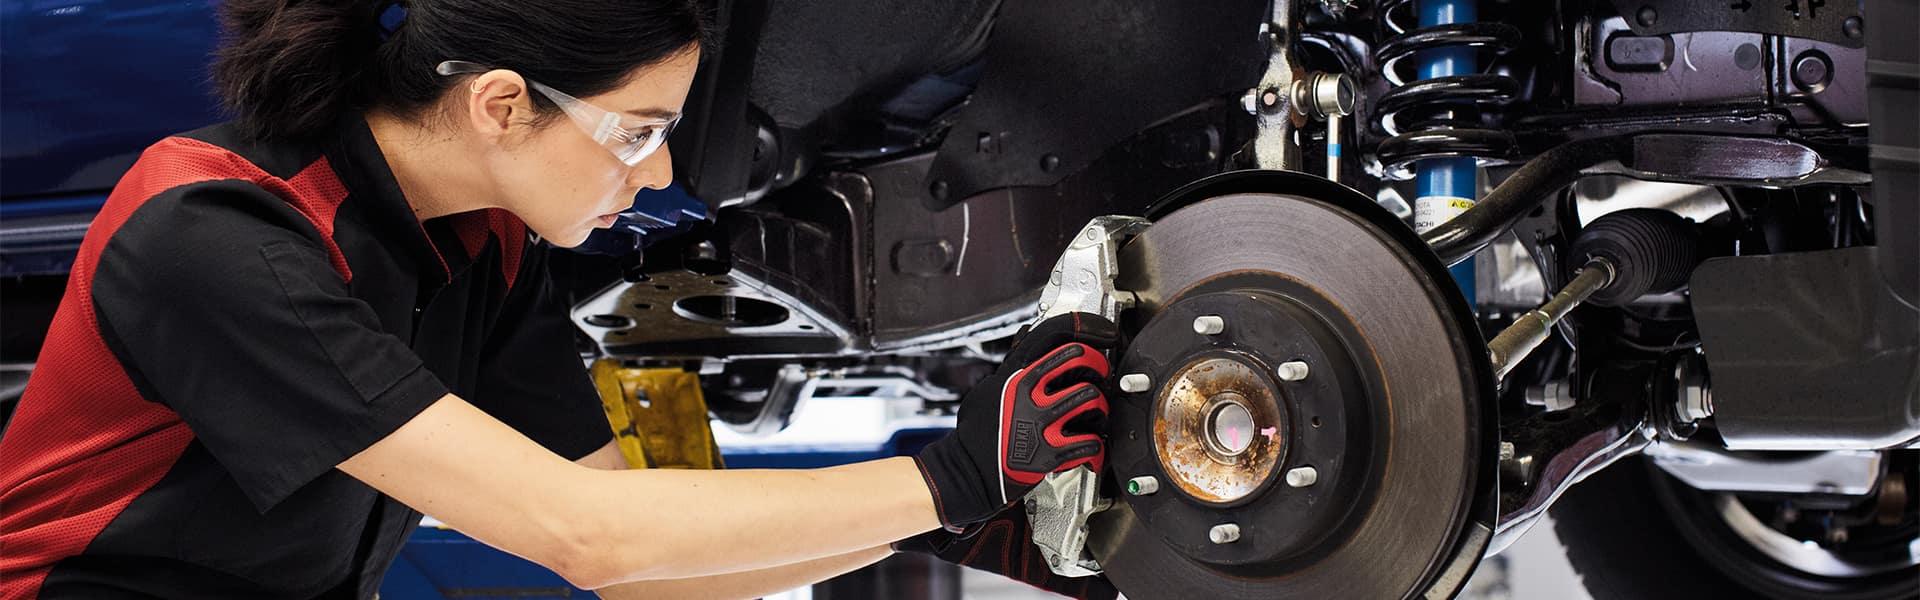 Halterman's Toyota is a Toyota Dealership near Cresco, PA   Service Advisor Fixing Brakes on Vehicle